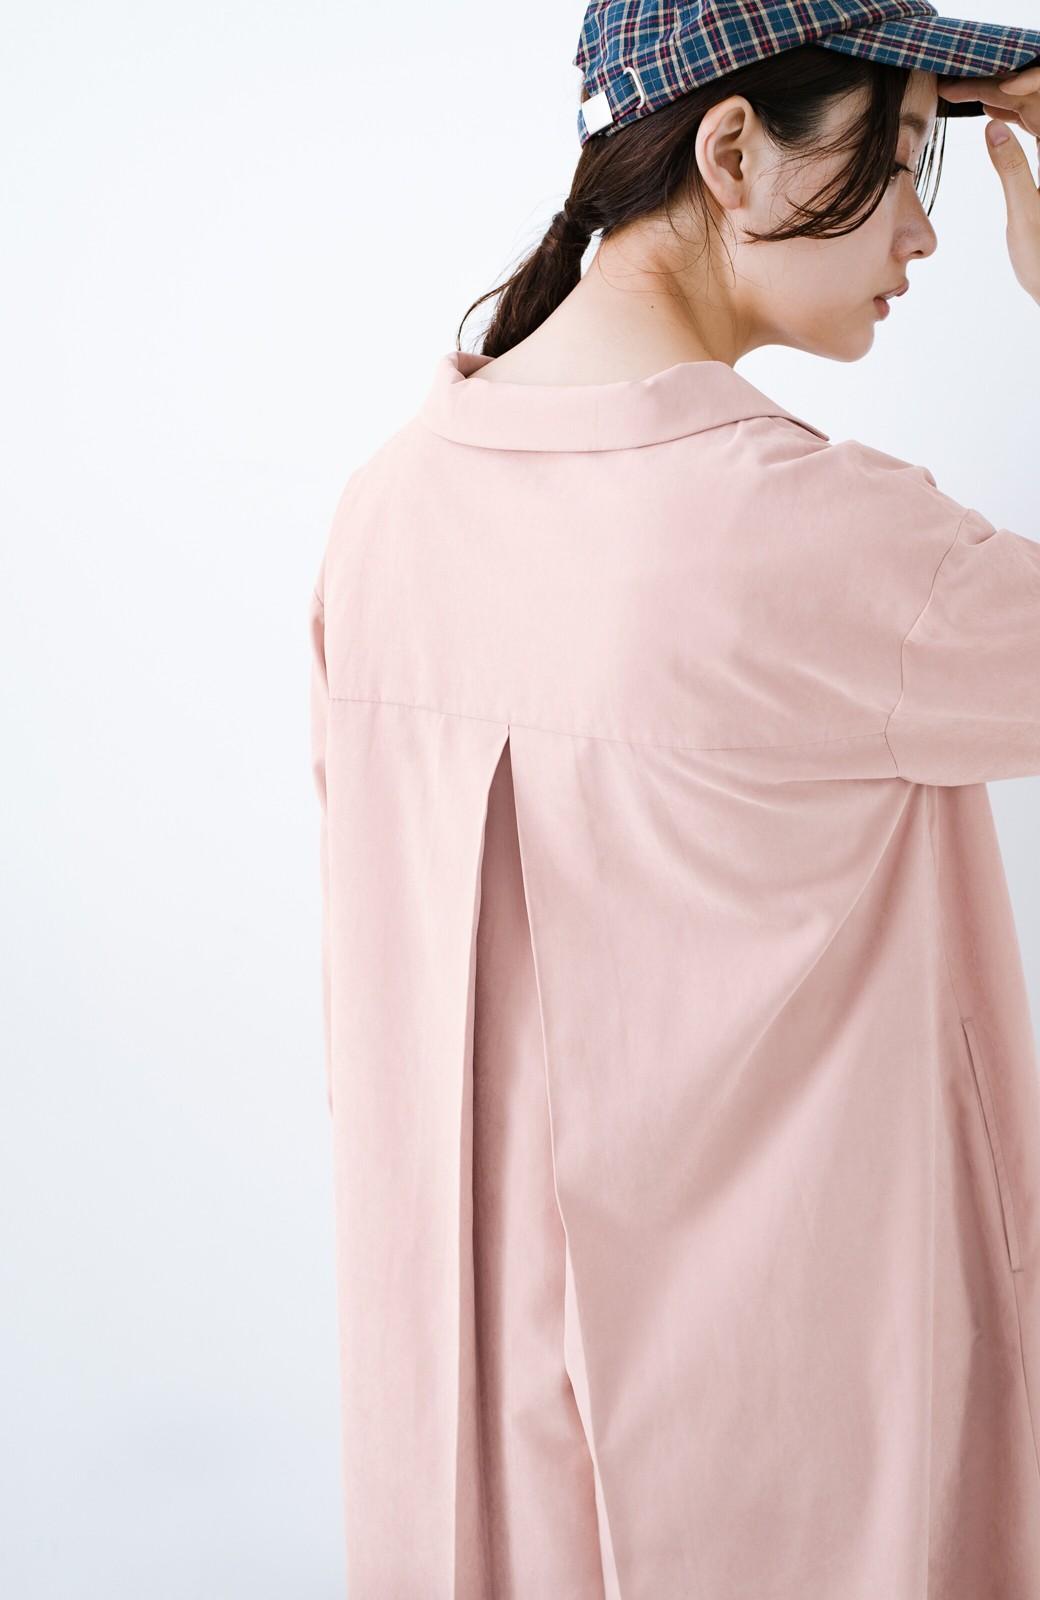 haco! 太ってもばれずに羽織っても便利なAラインワンピース <ピンク>の商品写真6